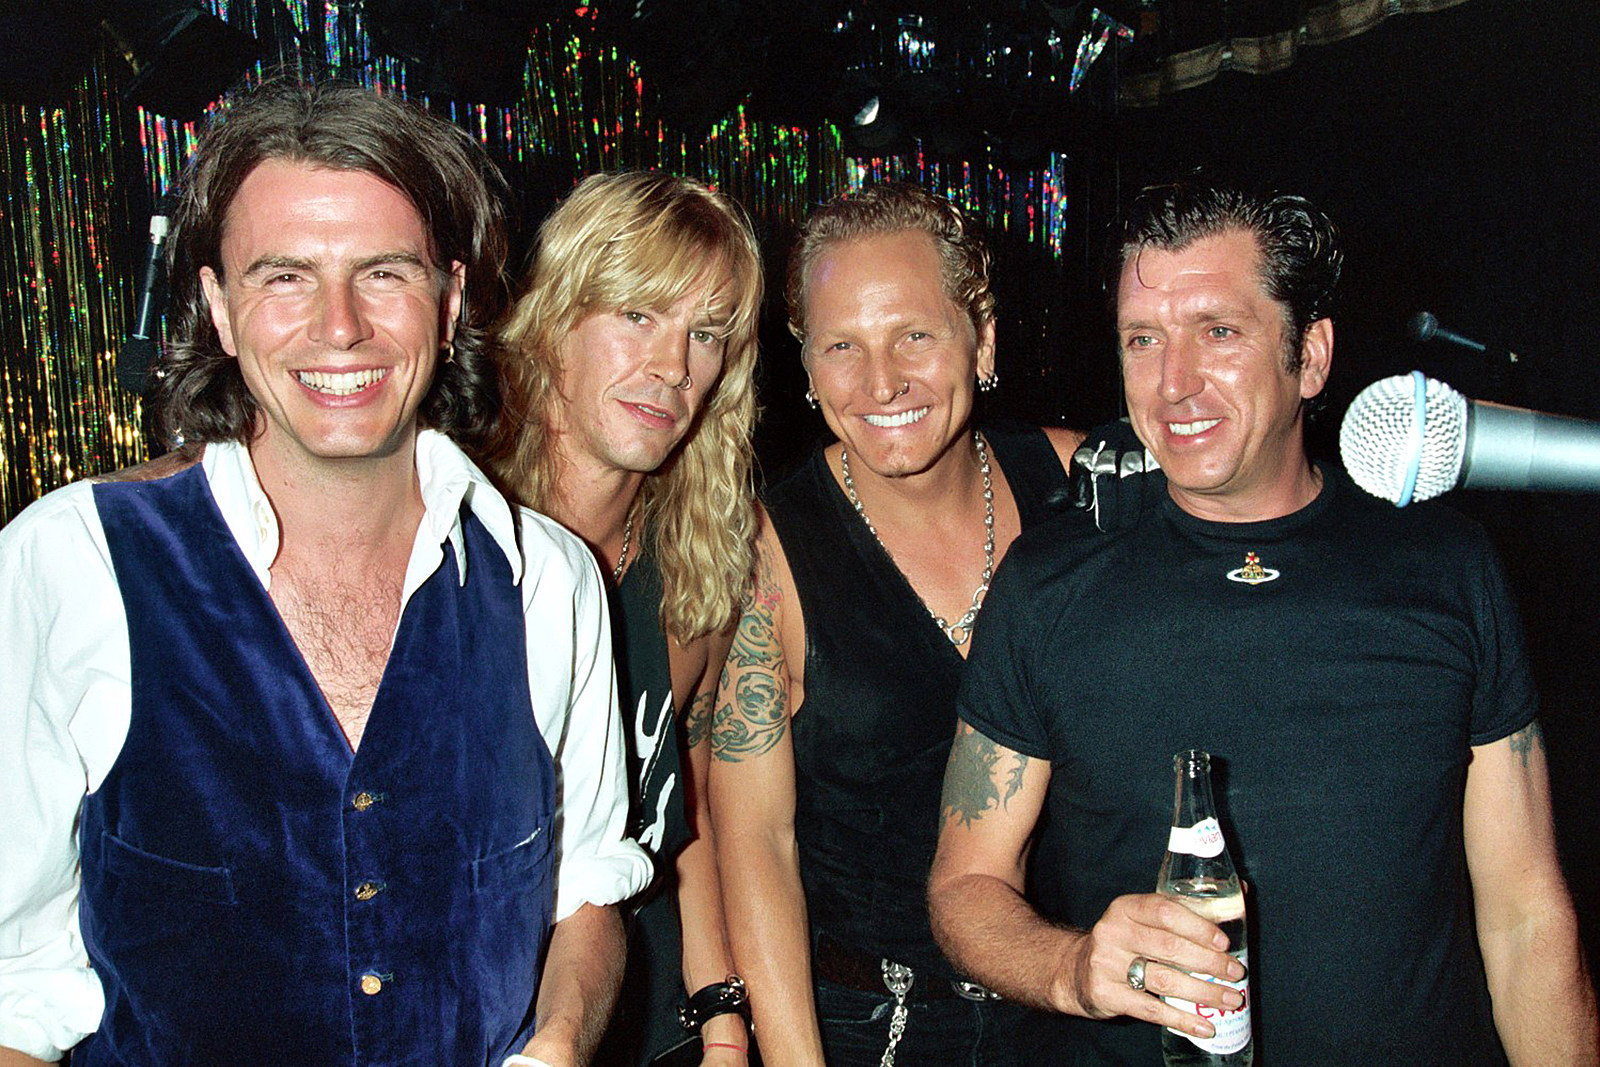 The Forgotten Sex Pistols, Guns N' Roses, Duran Duran Supergroup